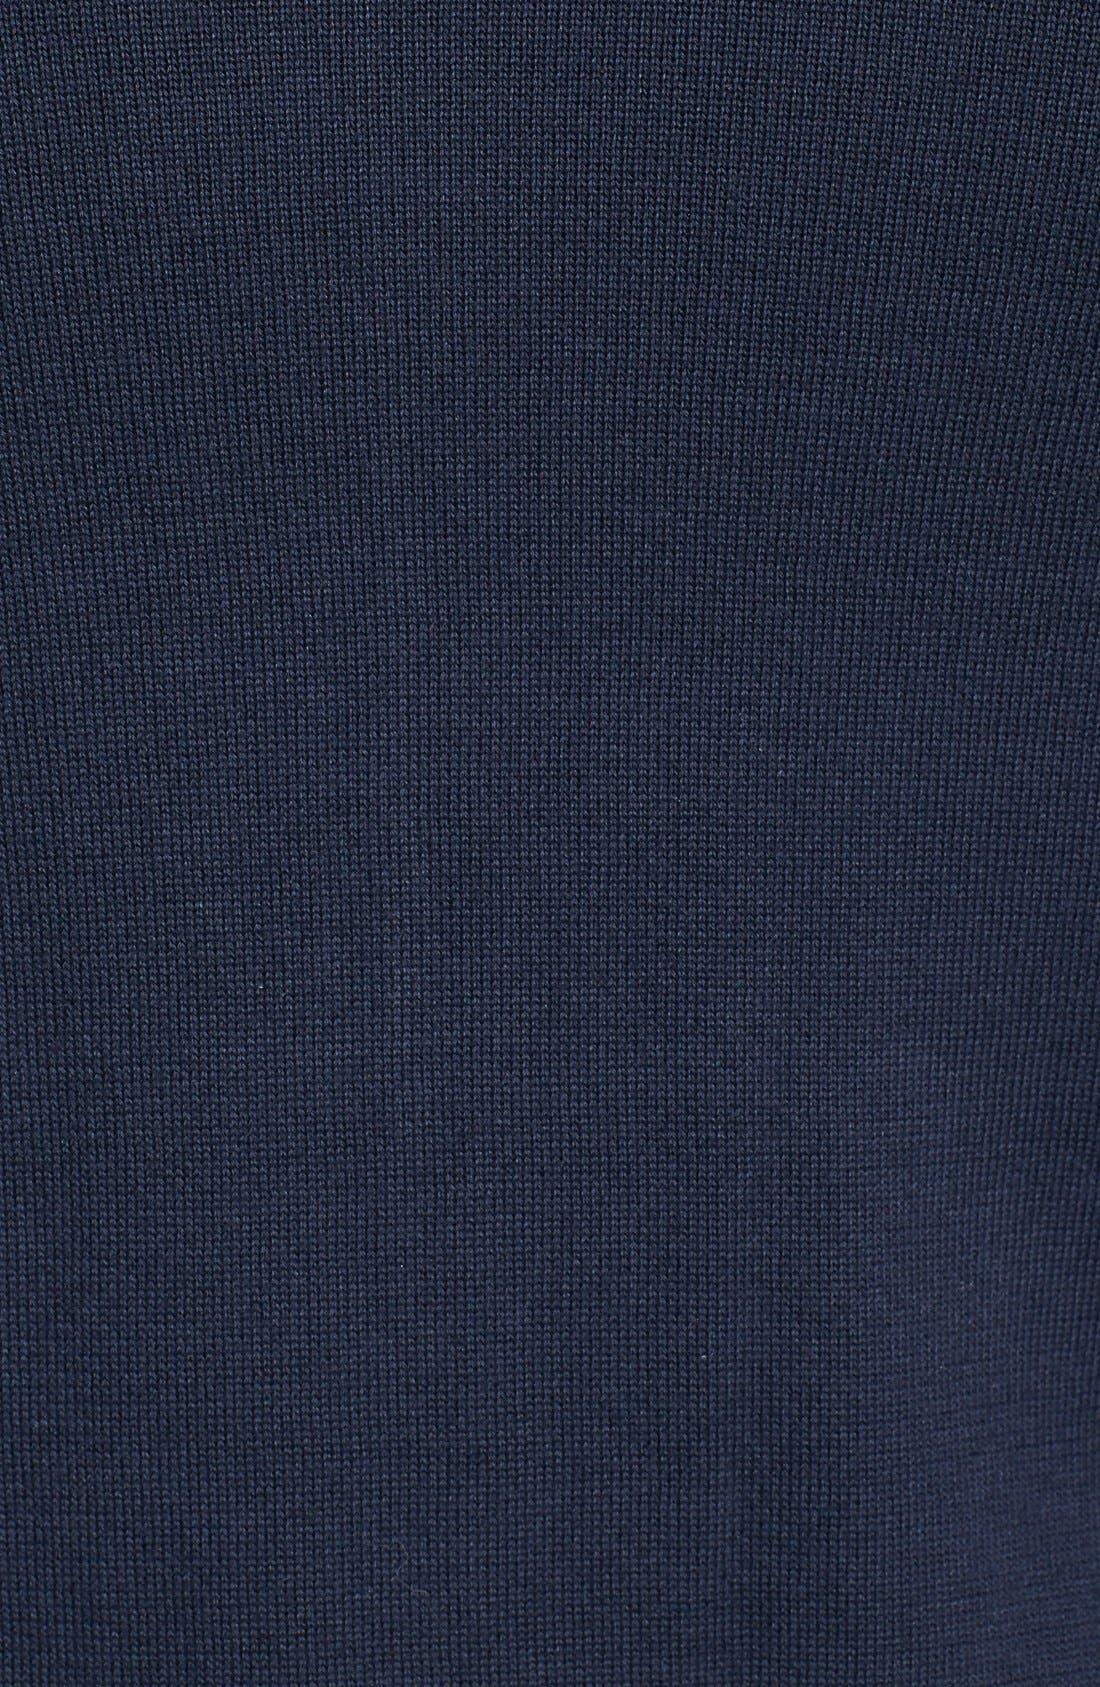 Alternate Image 3  - Façonnable Zip Cardigan